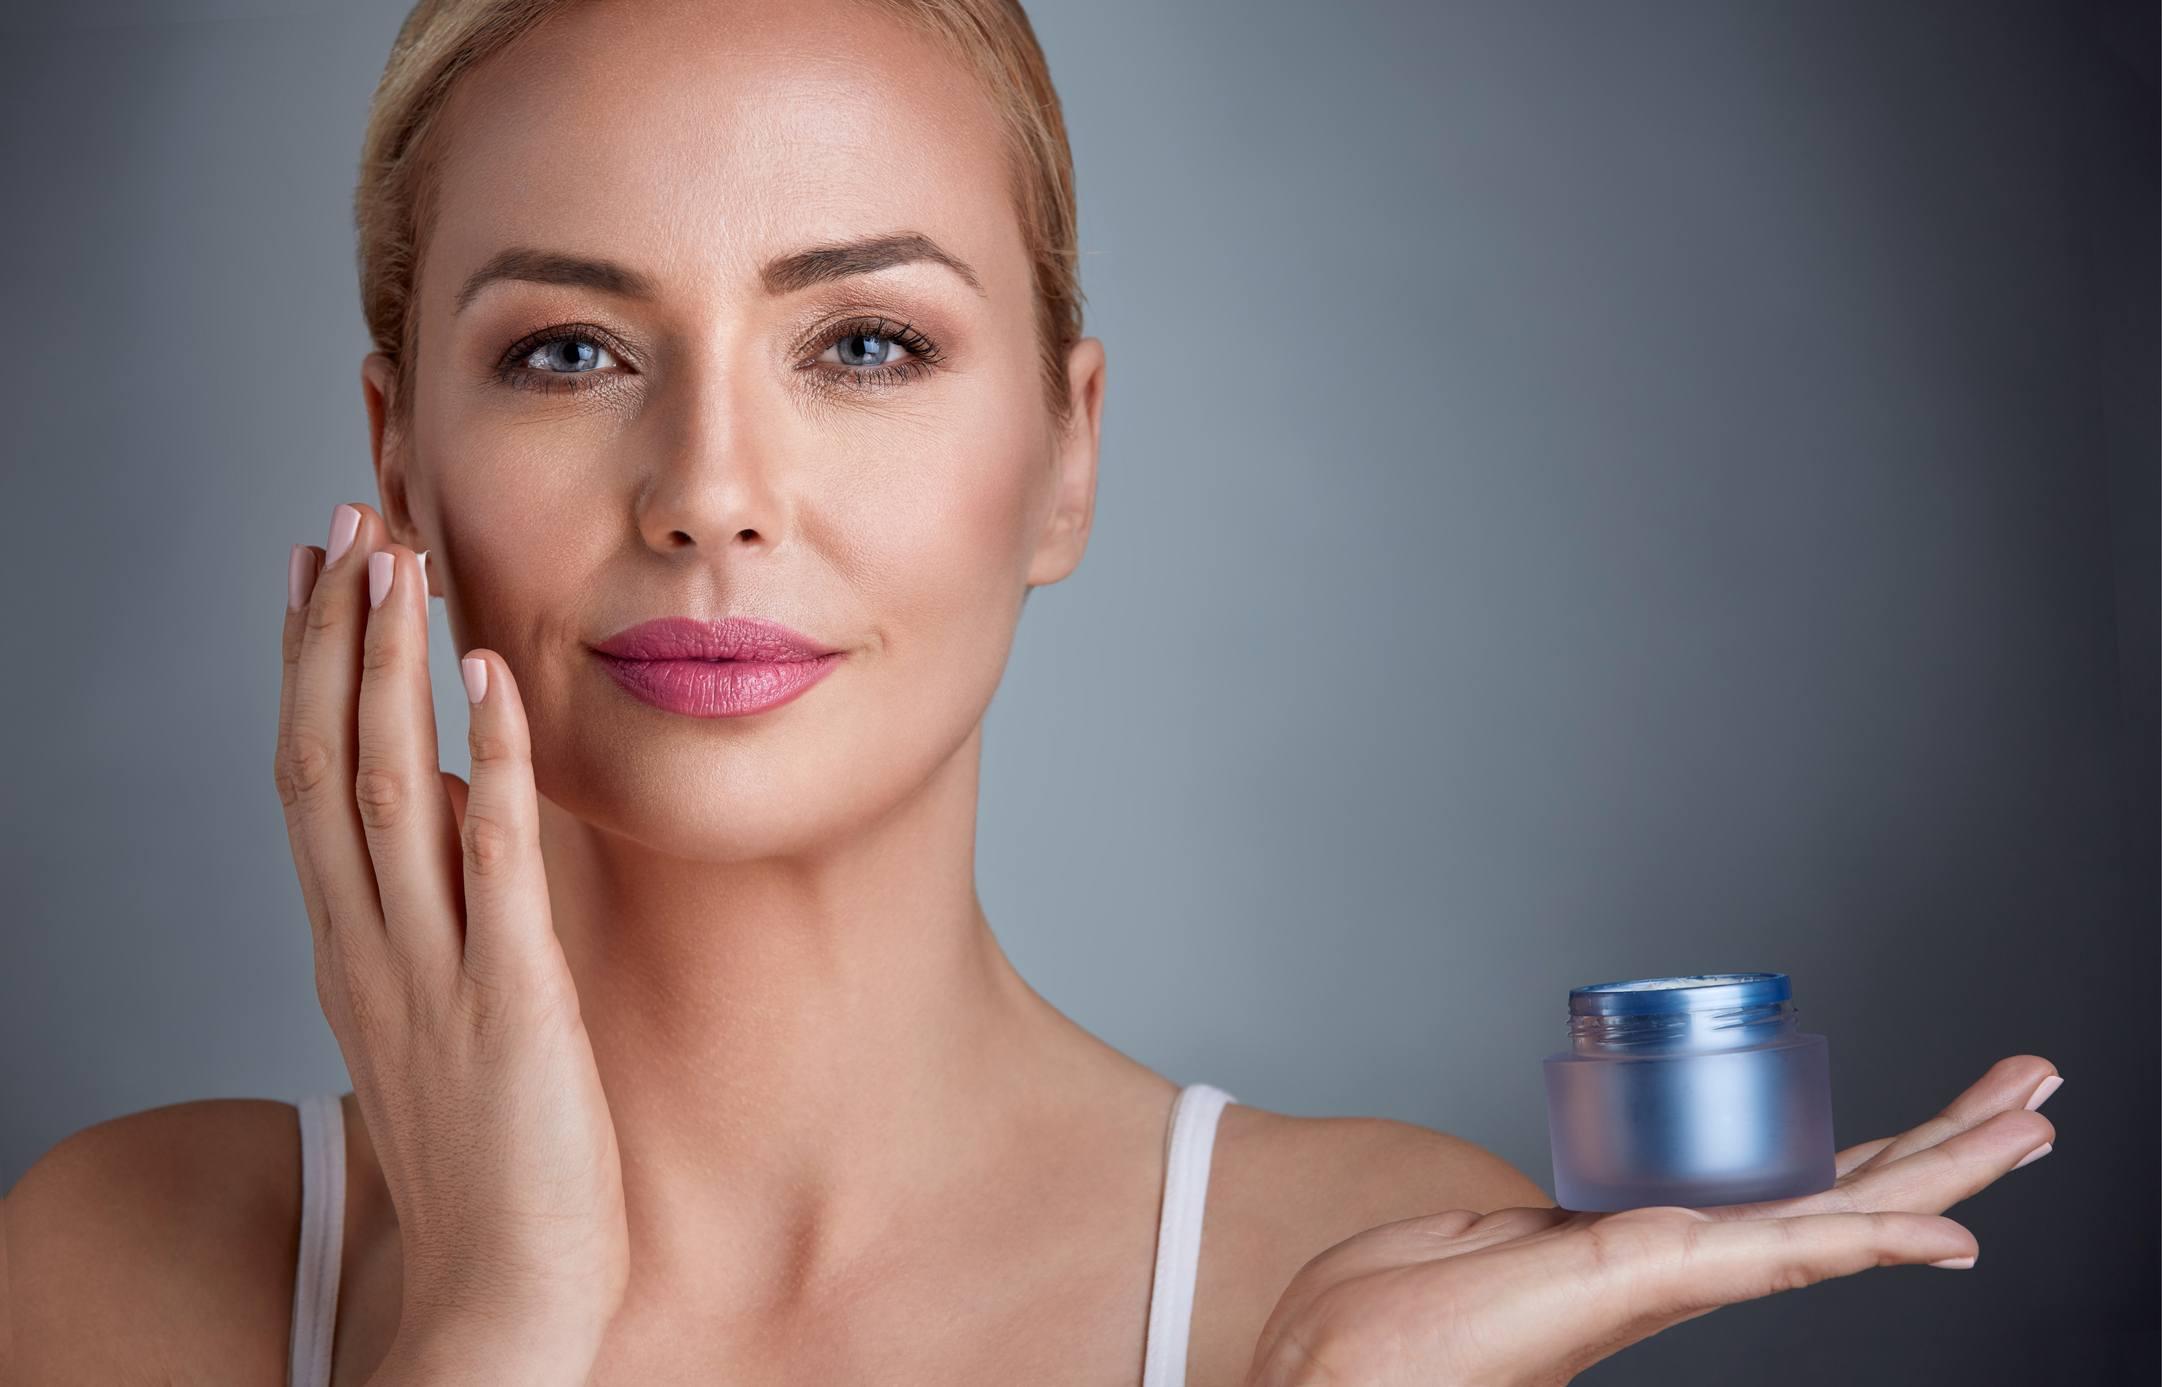 Woman applying moisturizing cream to her skin